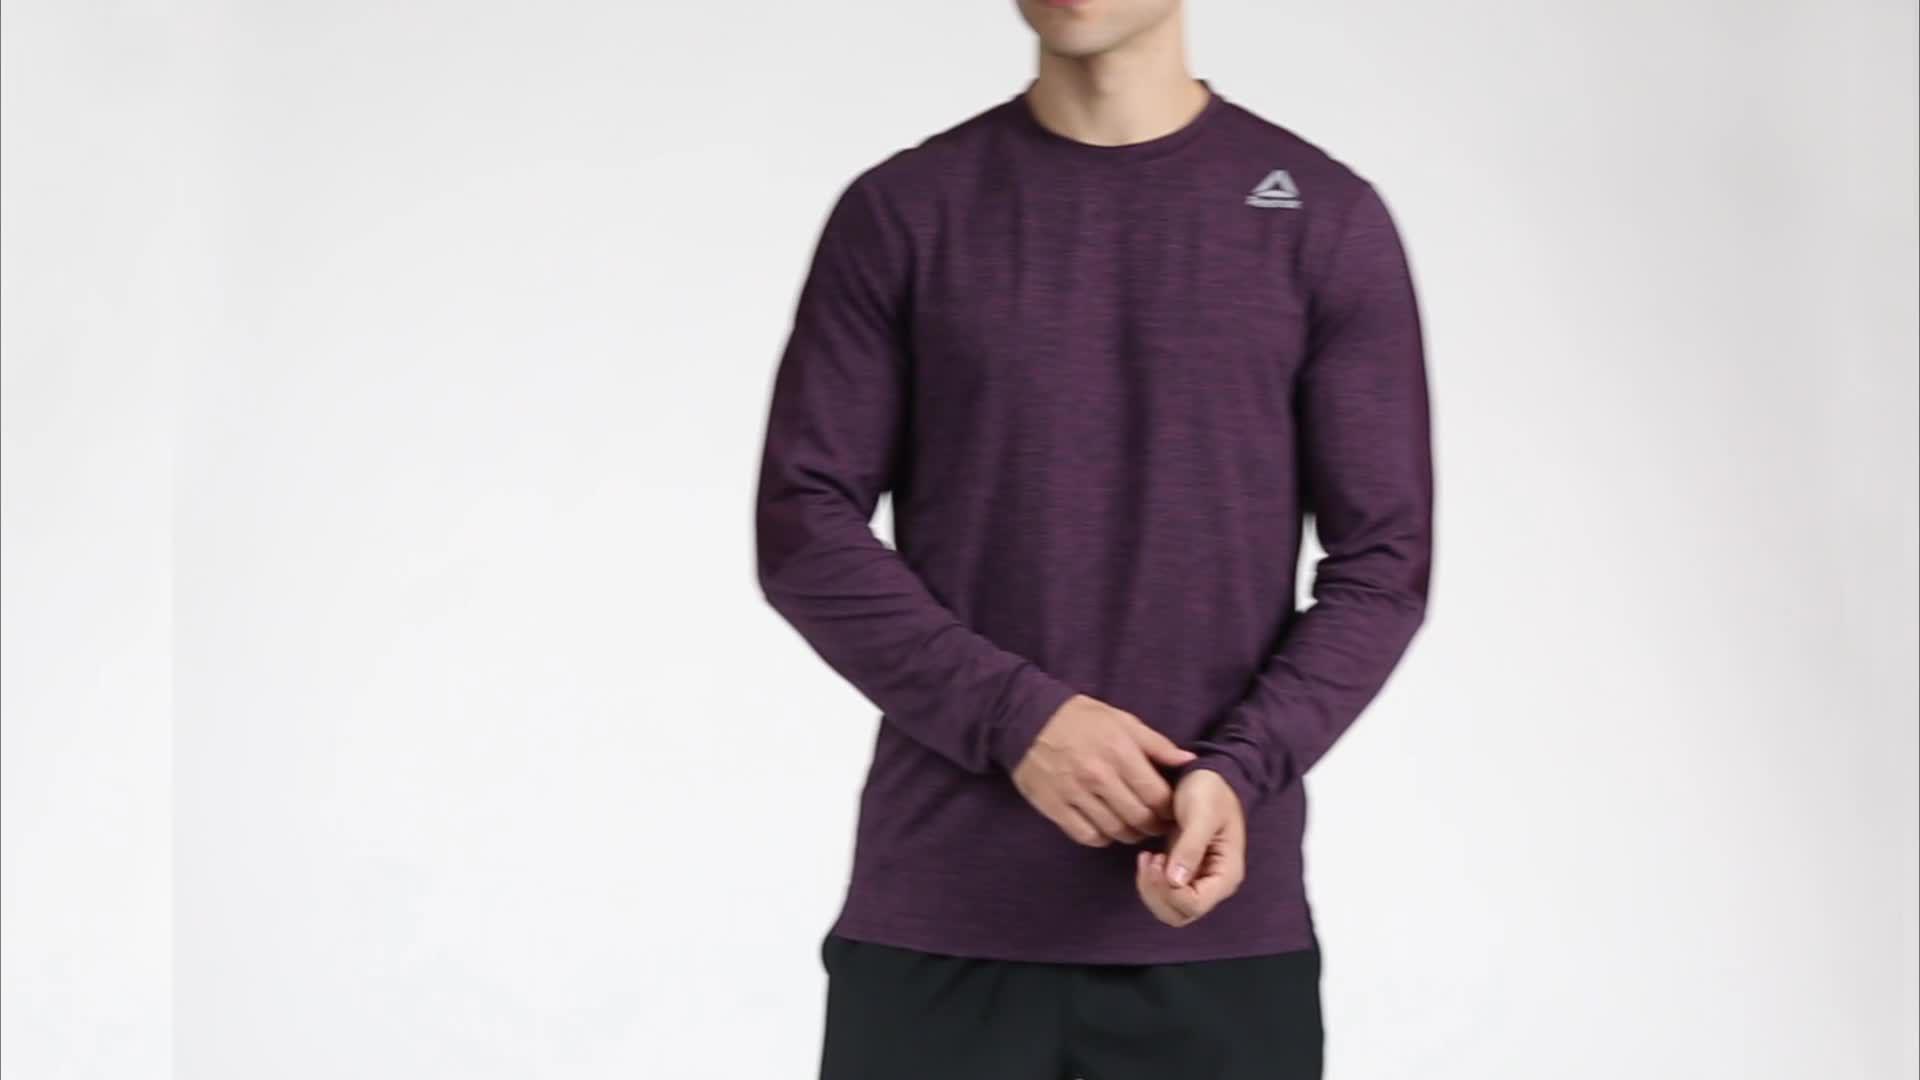 Brand New Reebok Men/'s 24//7 Crewneck Long Sleeve Shirt